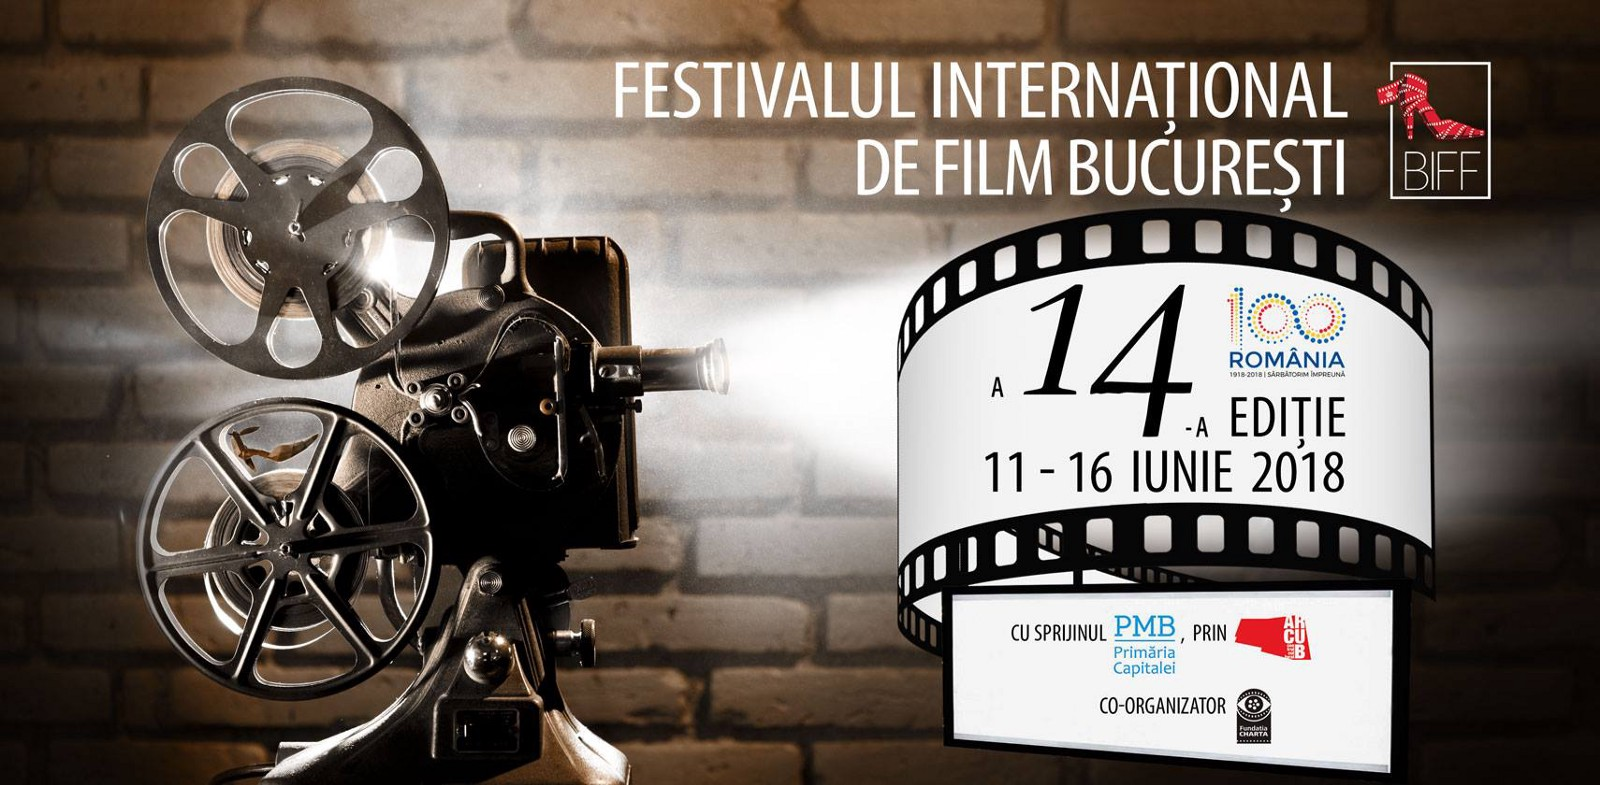 biff 2018, festival film, bucuresti, 11-16 iunie 2018